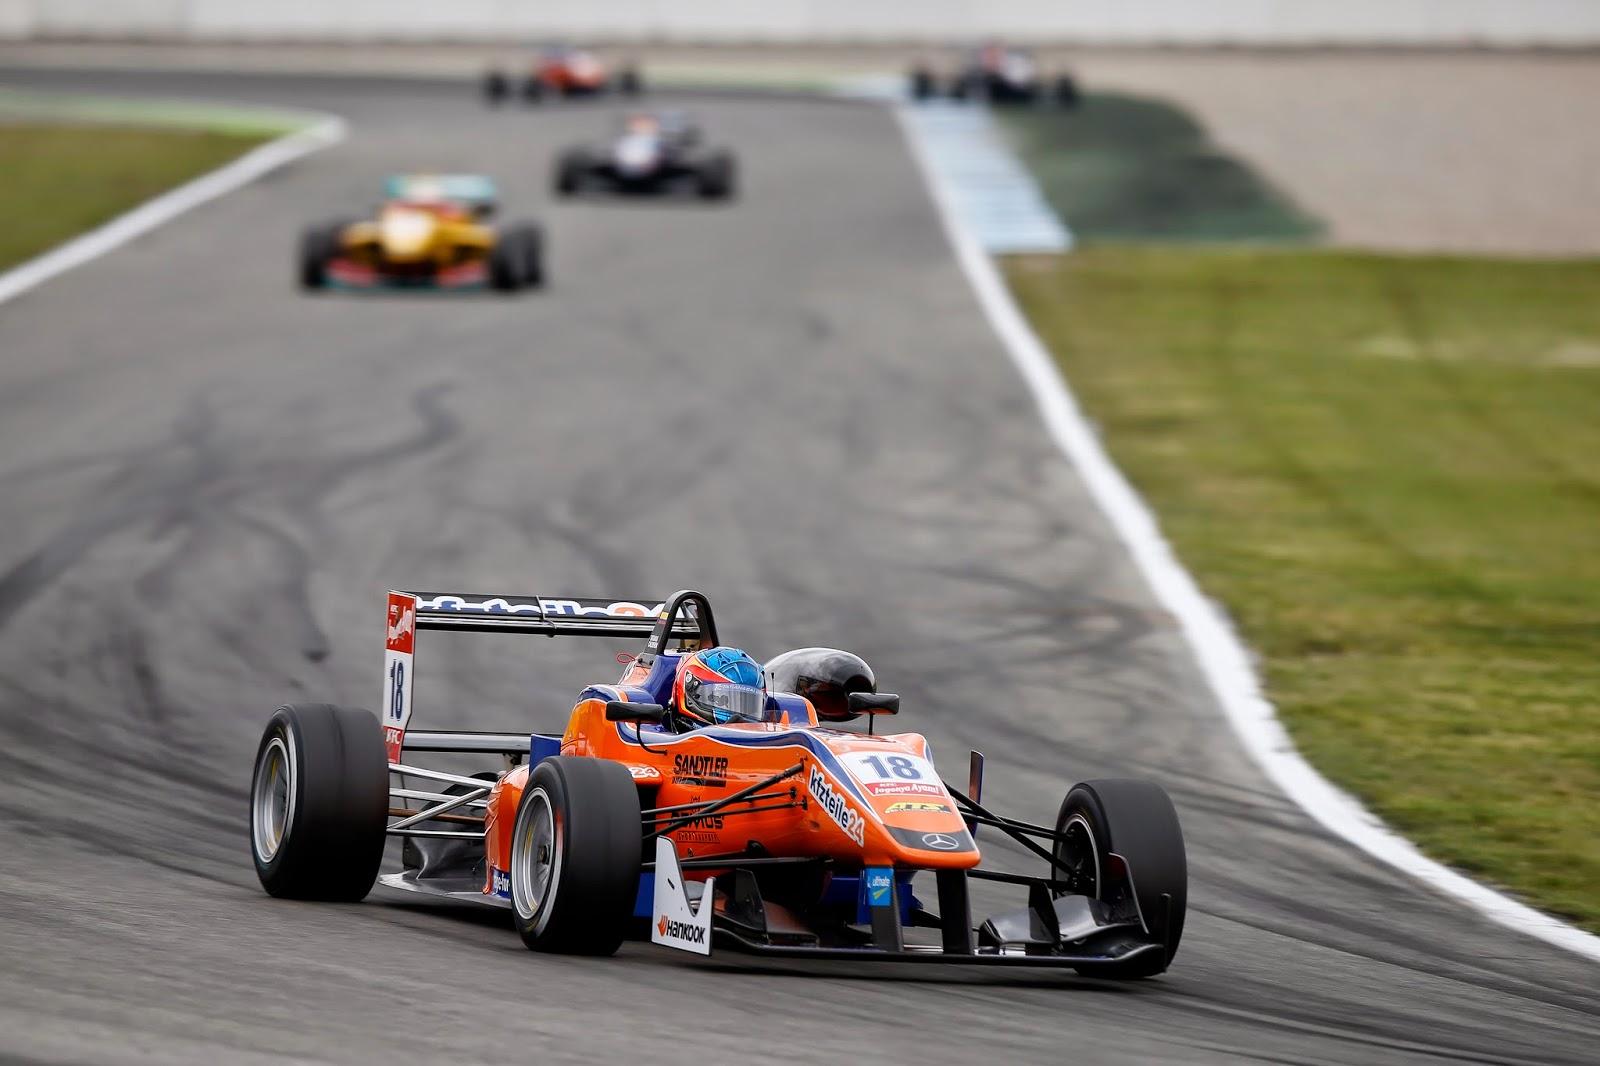 "<img src=""CalderonF3.jpg"" alt=""FIA F3 Tatiana Calderon Hockenheim"" title=""Tatiana Calderon en Hockenheim"" />"